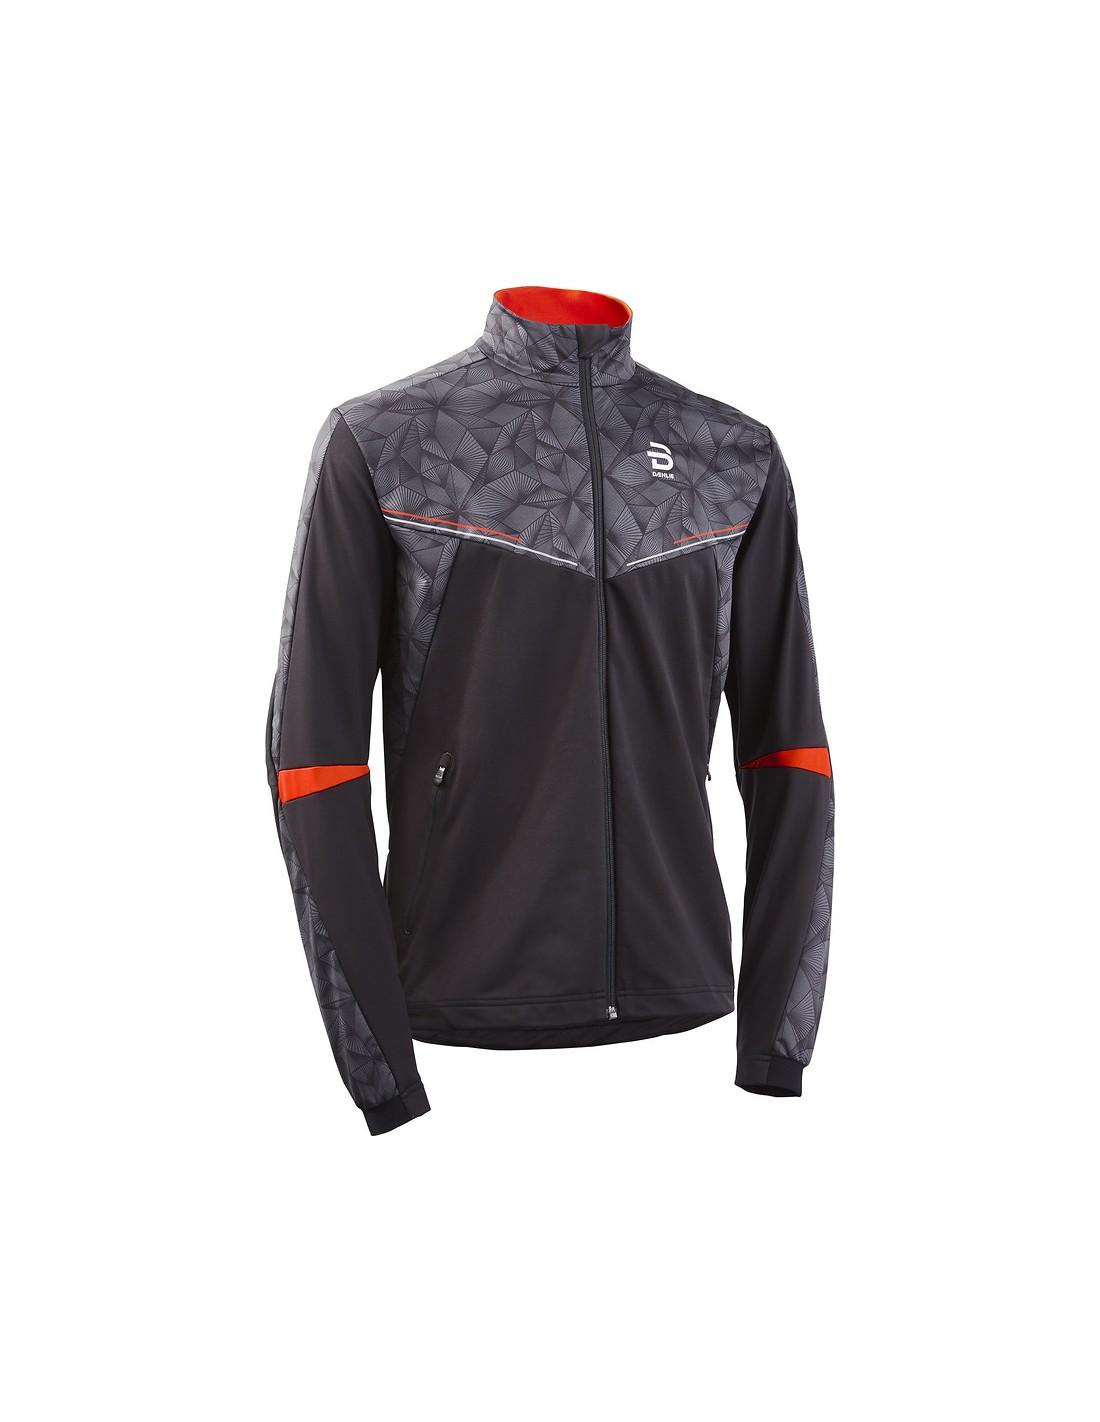 Treningsjakker Herrer Bjørn Dæhlie Intent Jacket Black/Orange SportsDeal! 332061-99900 699 kr